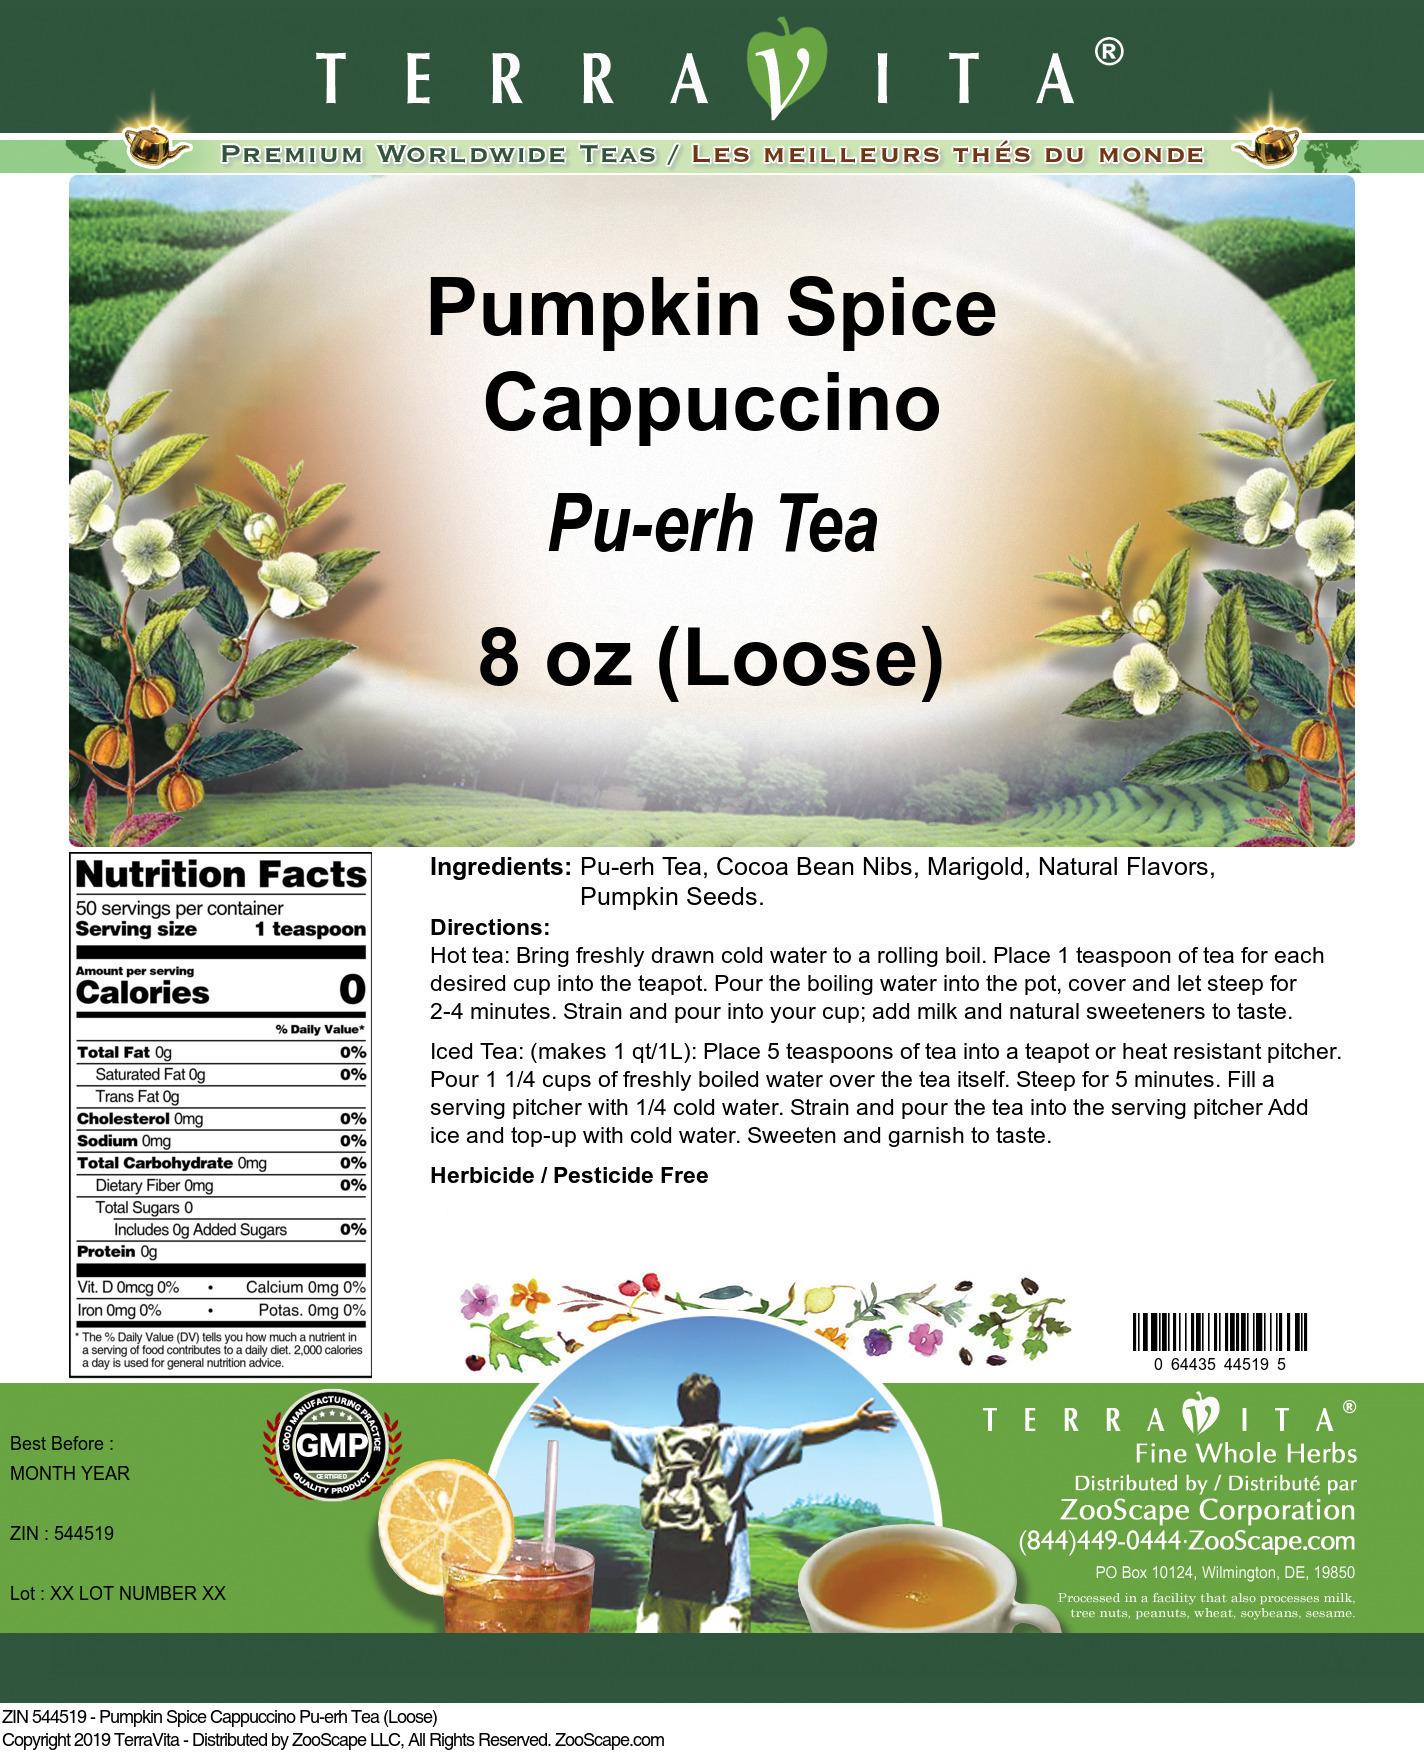 Pumpkin Spice Cappuccino Pu-erh Tea (Loose)